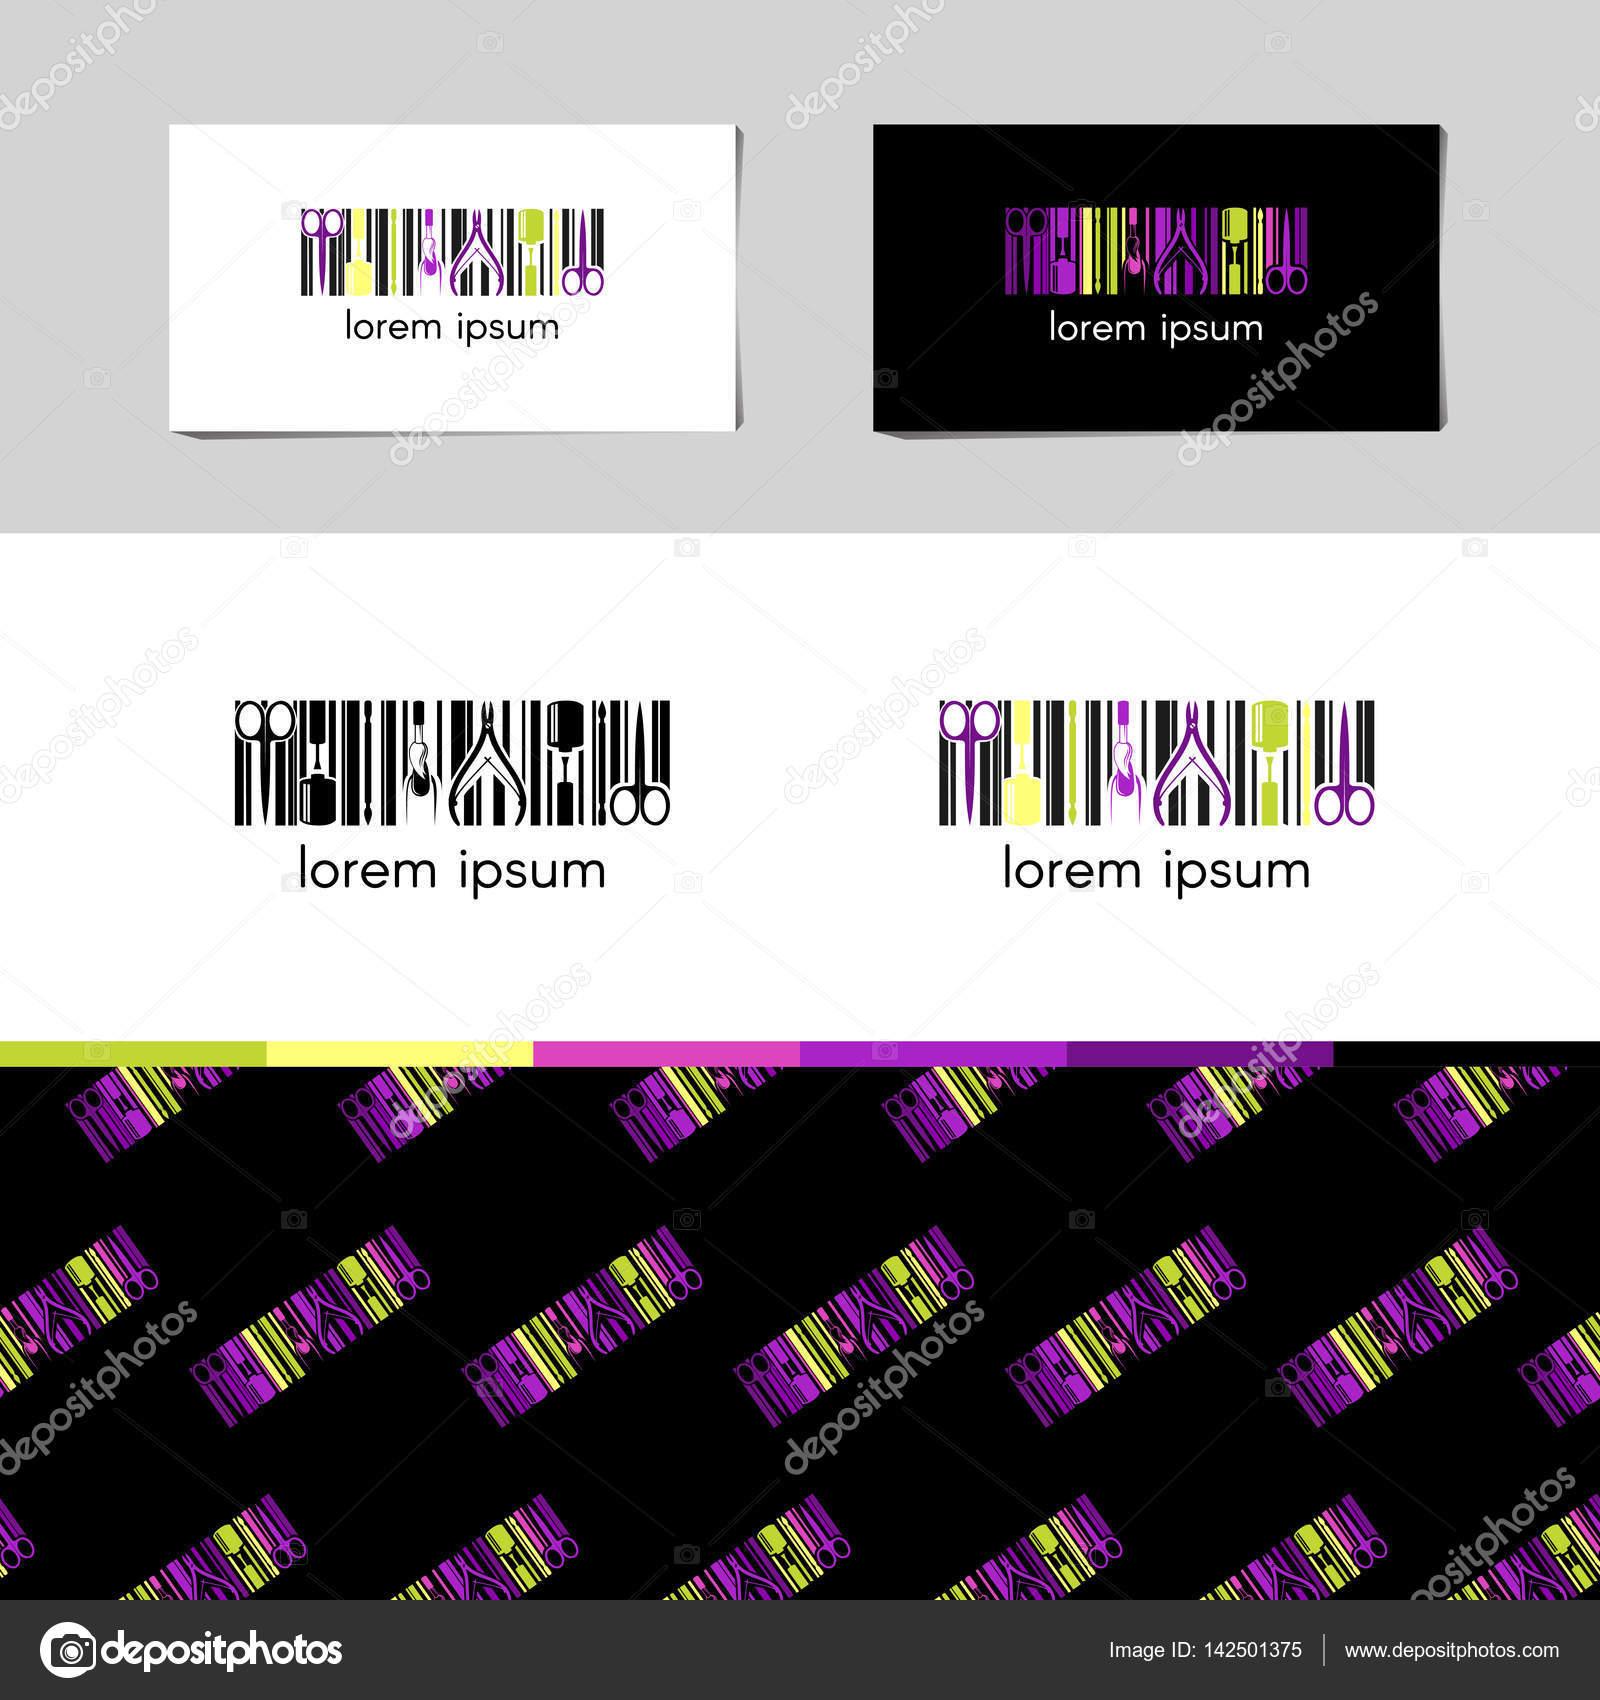 vektor logo fr nagel design firma mit namen visitenkarte und corporate muster im - Muster Fur Nagel